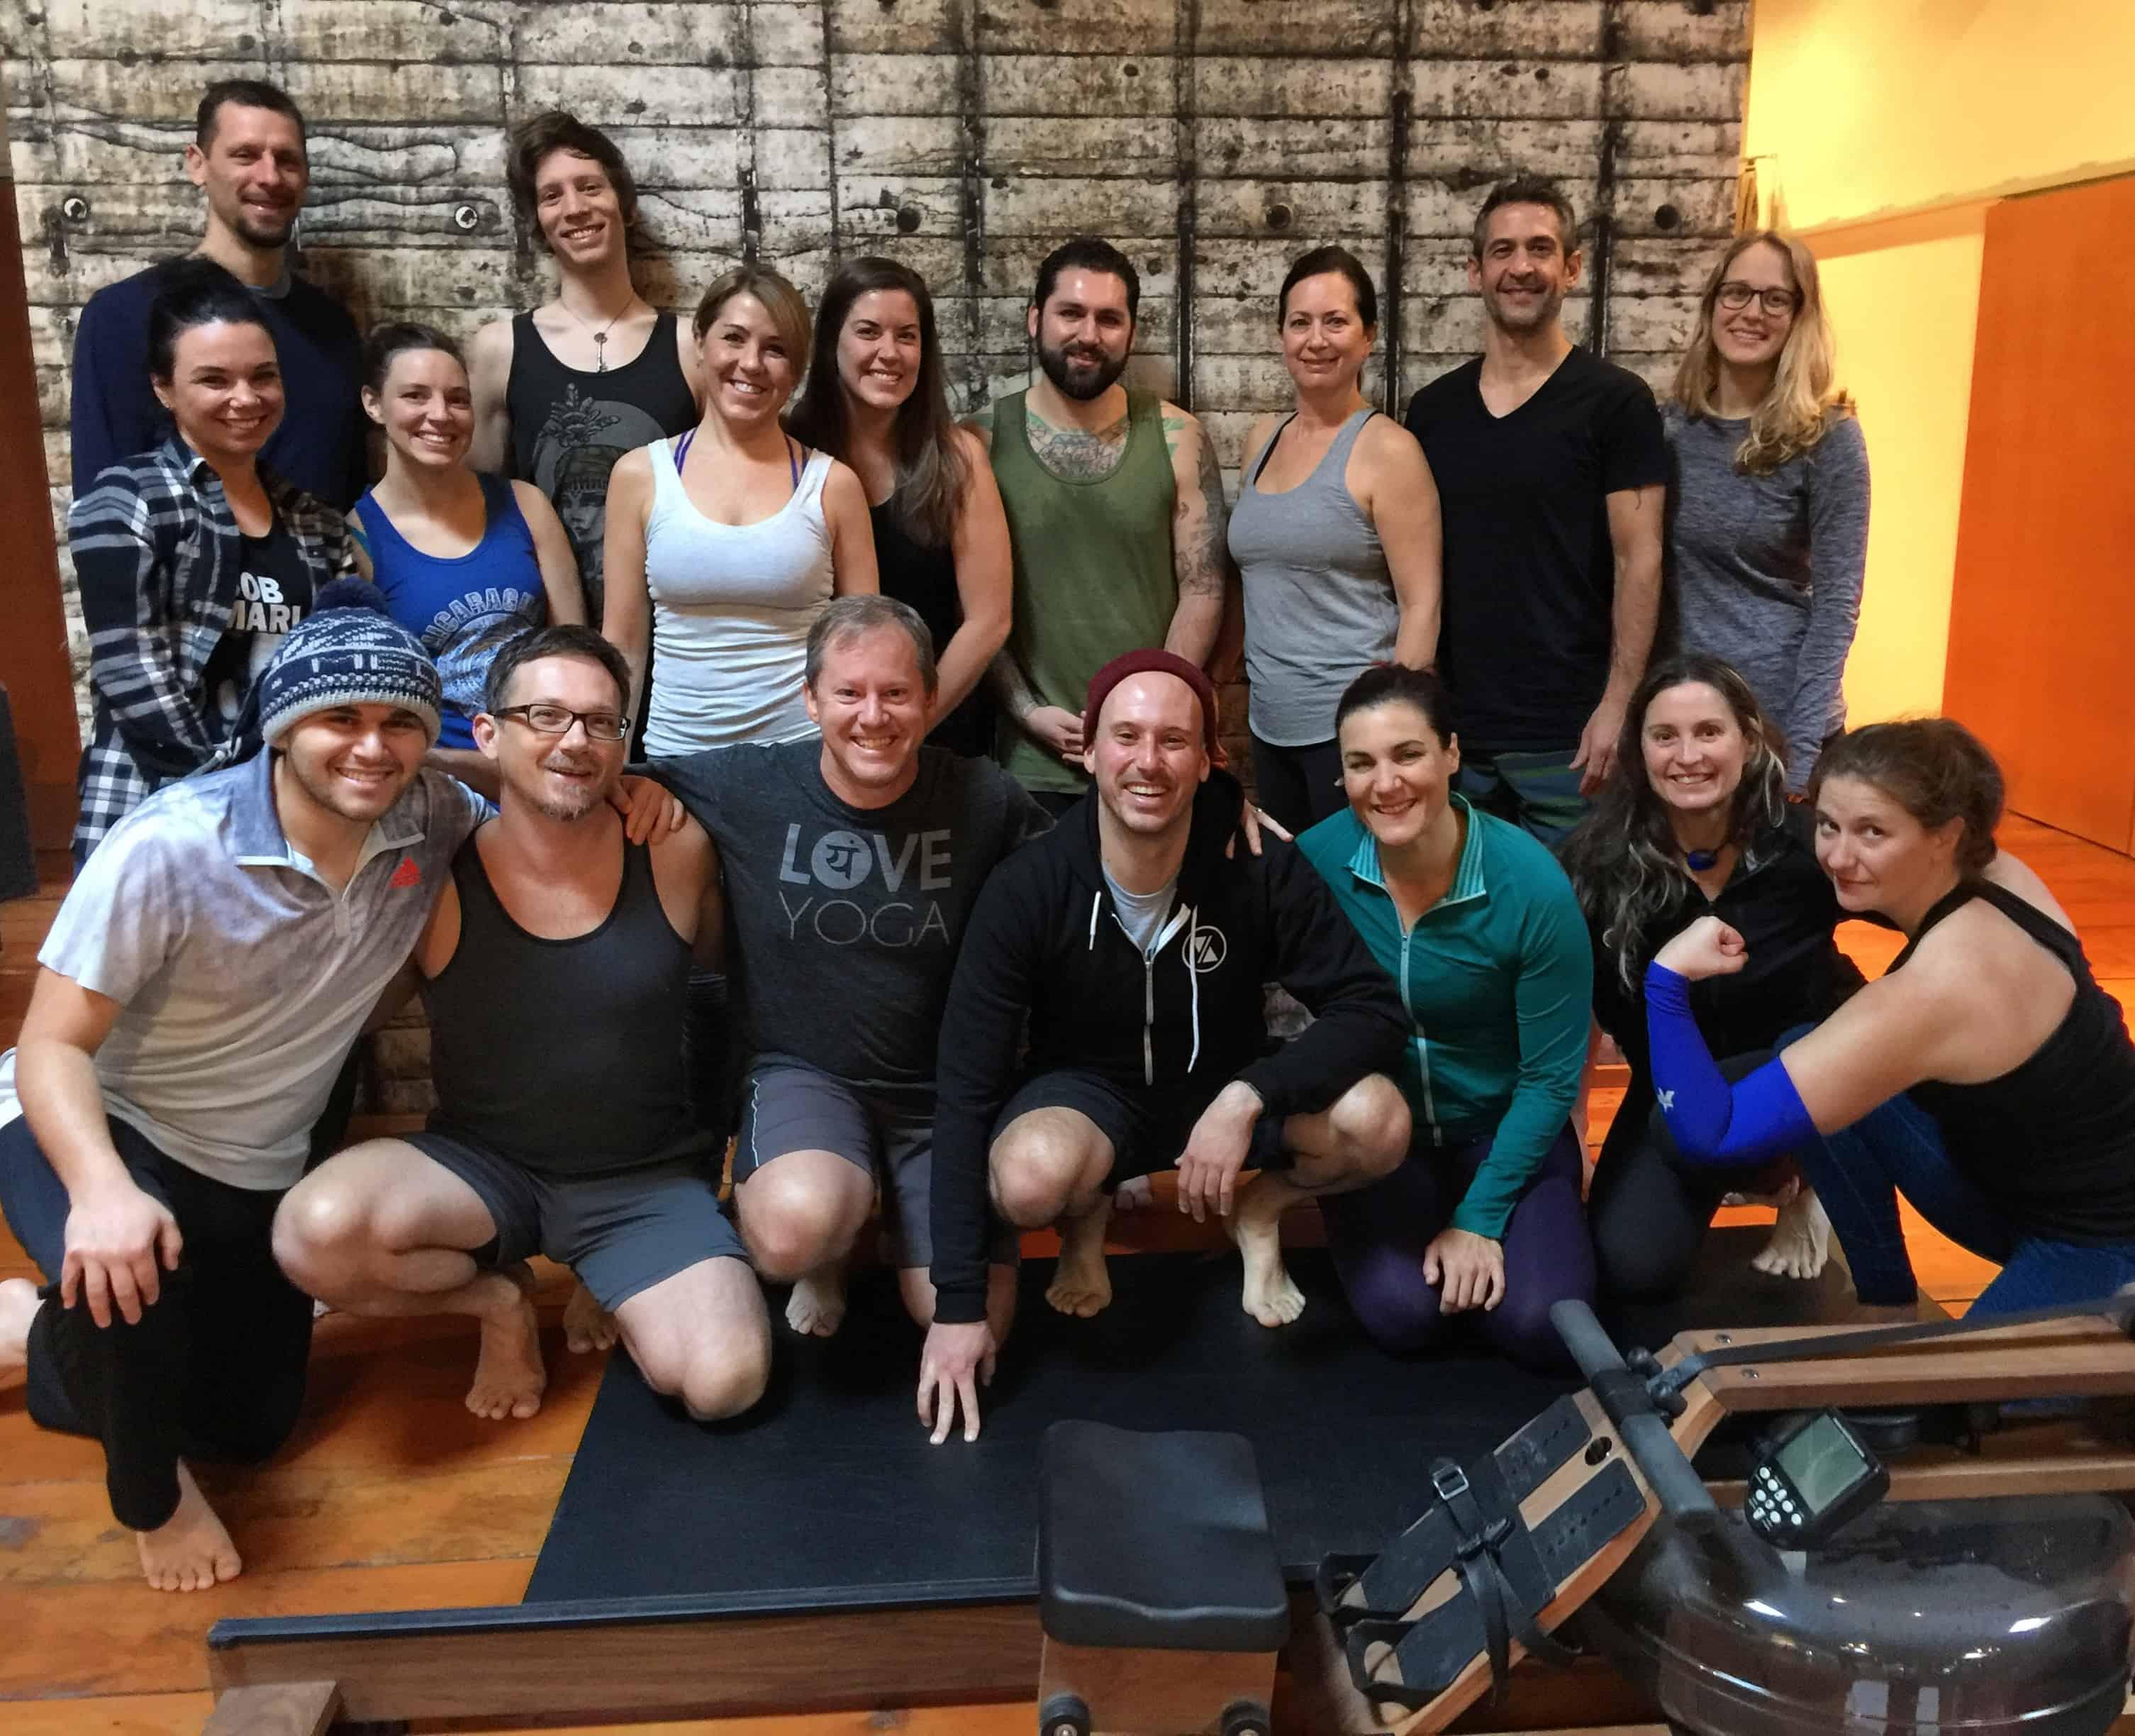 Today was the final for my 200 hour Yoga Teacher Training. I taught a class to my peeps! #jillknouseyoga #yogateachertraining